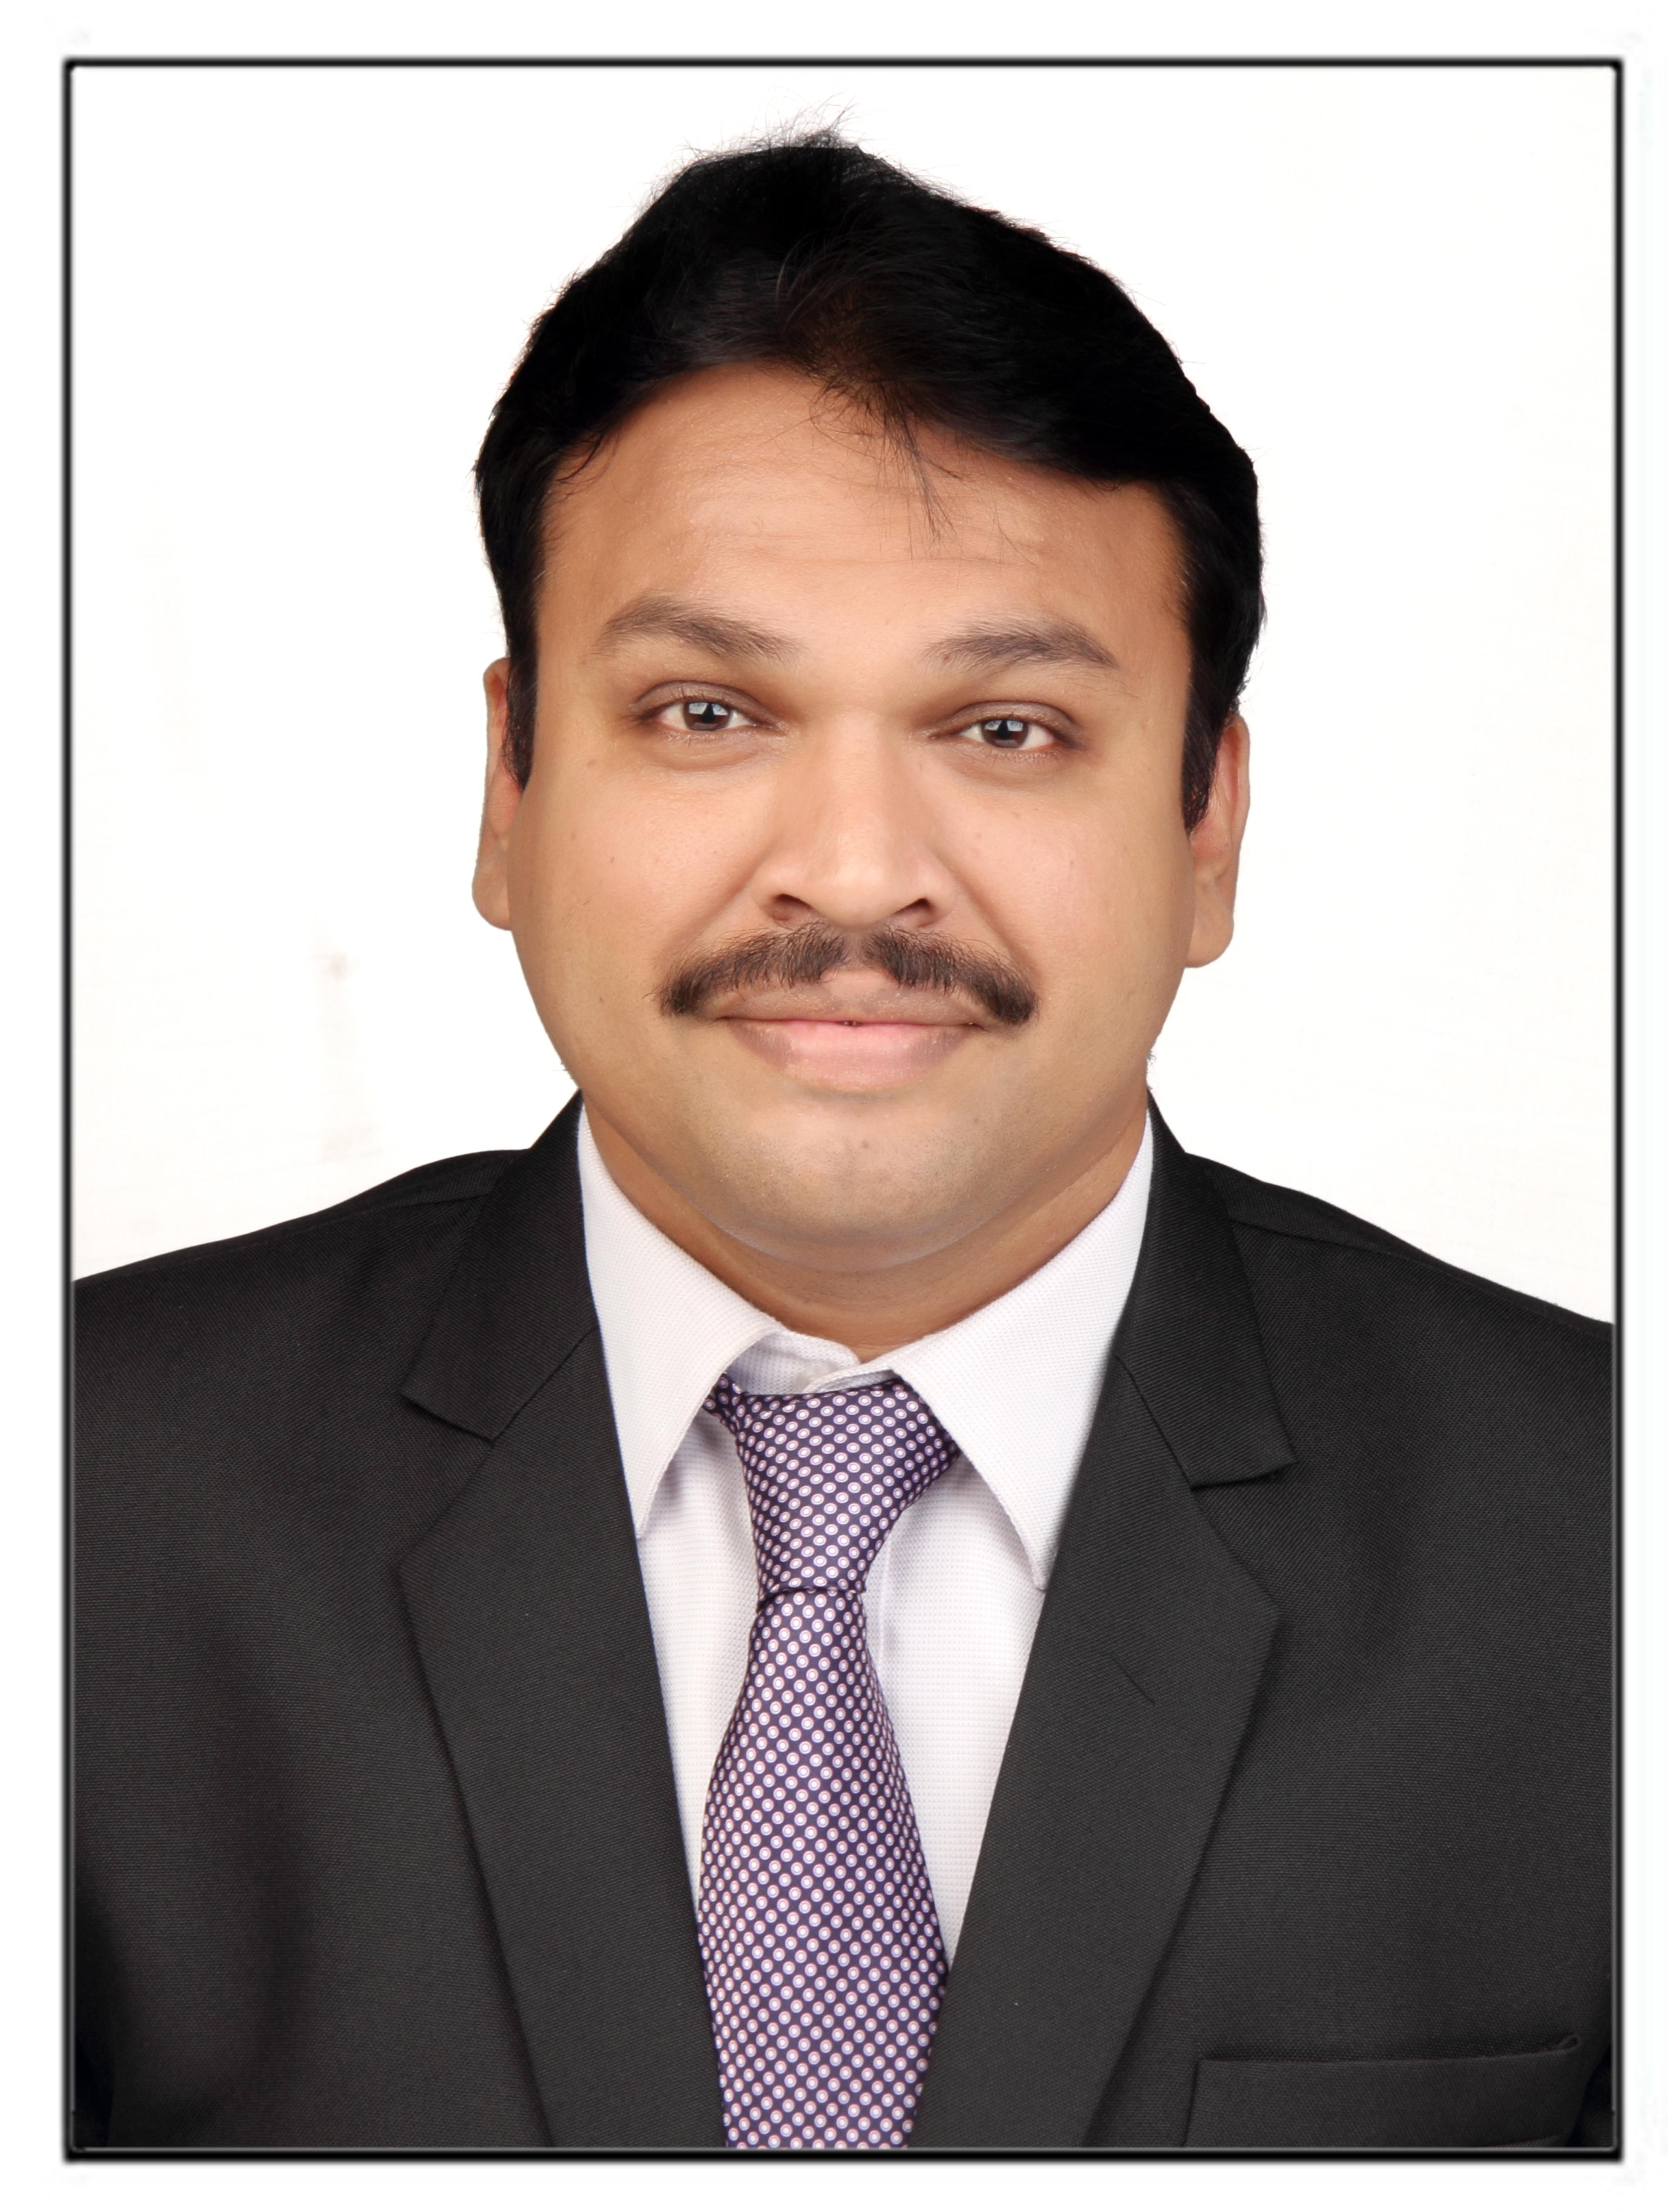 Kaushal Pandey